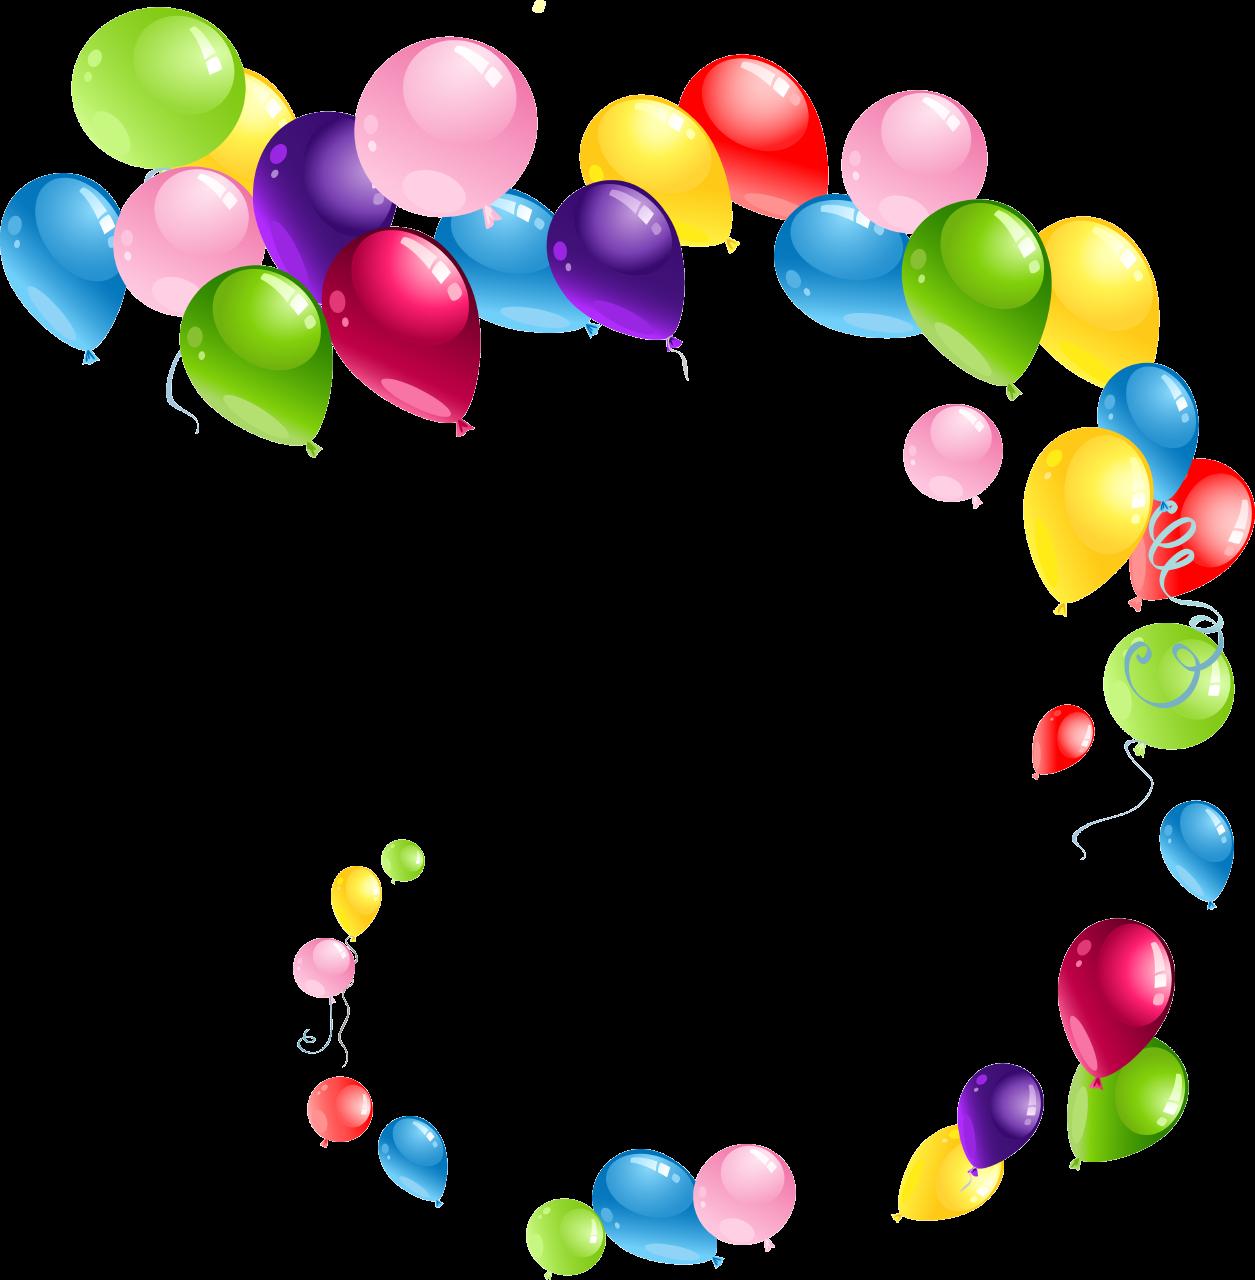 balloon PNG image